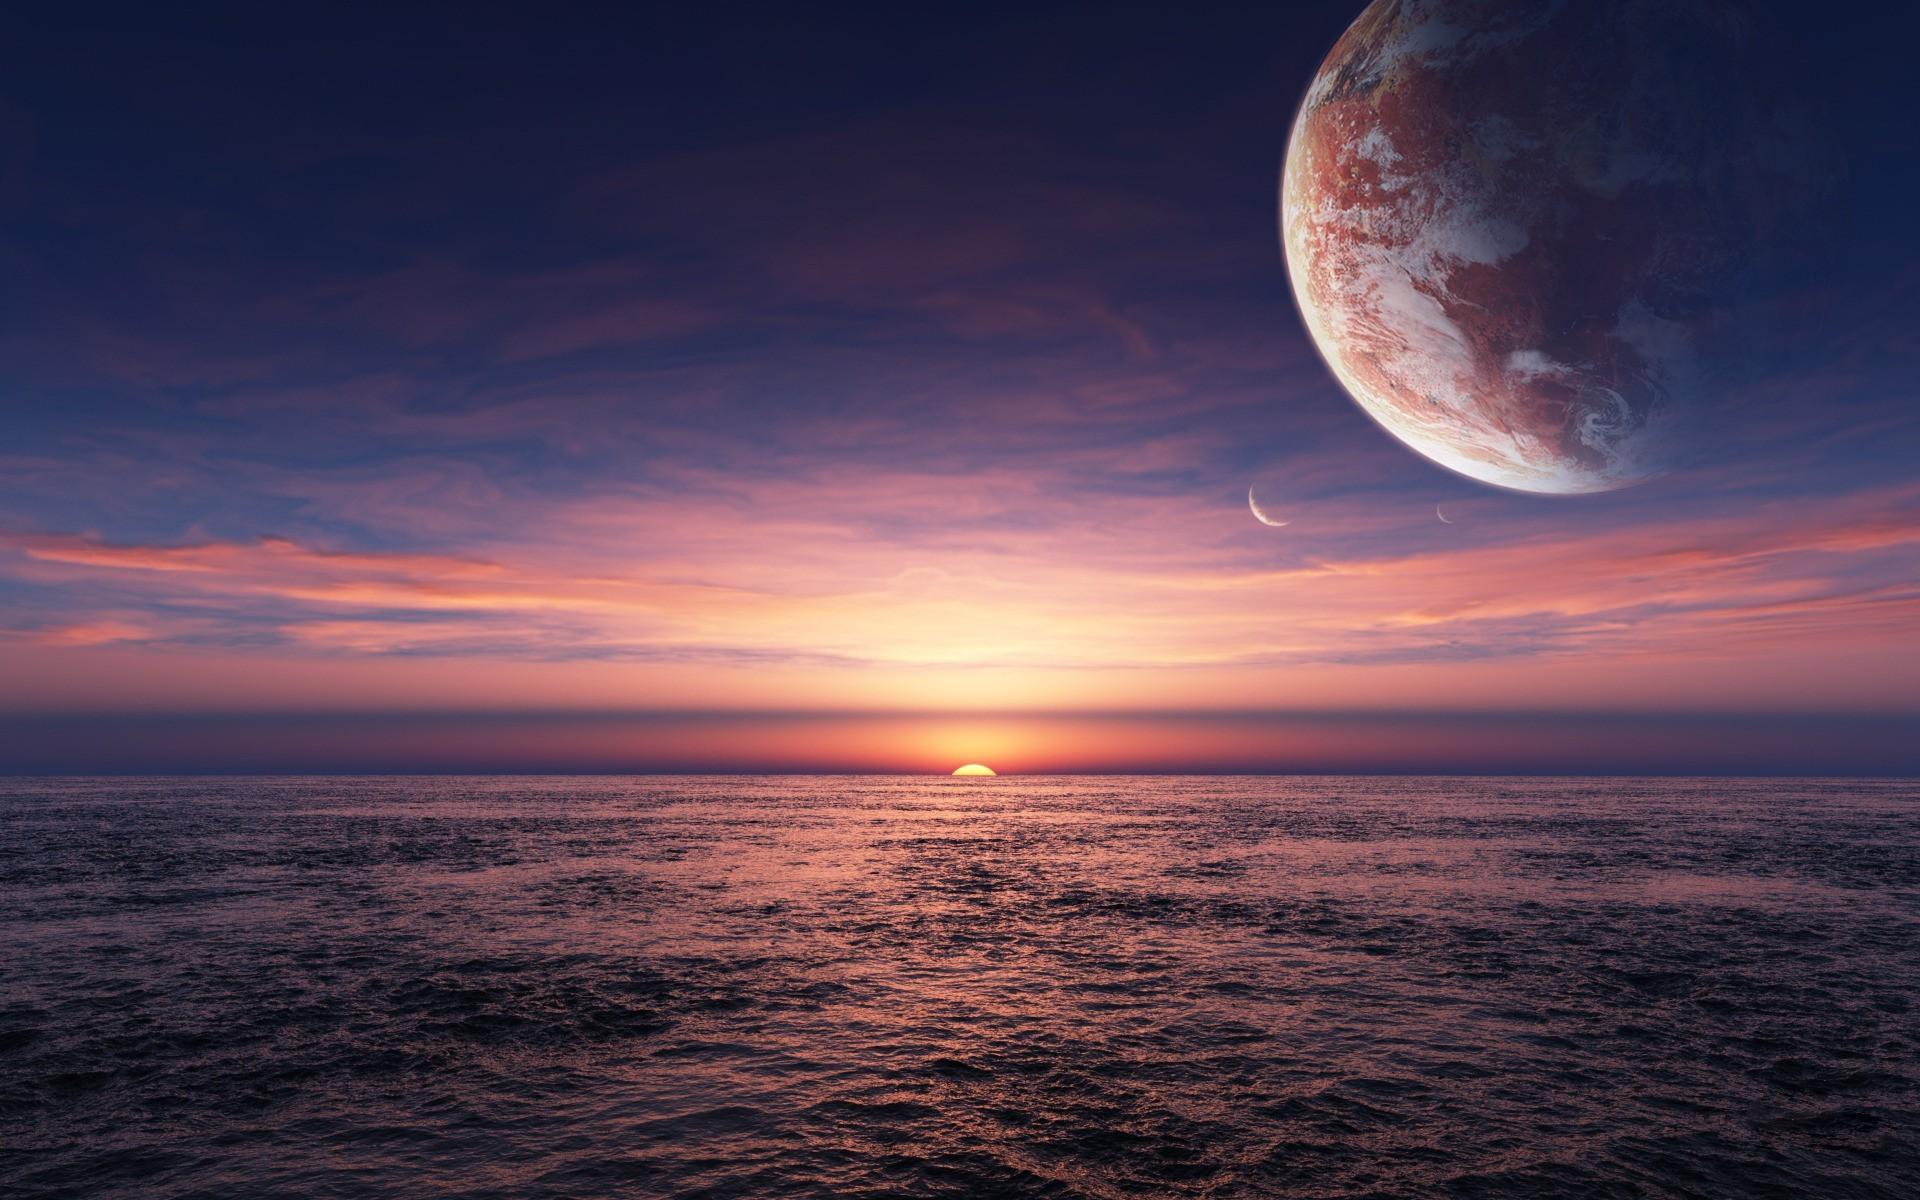 Water Ocean Sun Sea Planets Alien Landscapes Wallpaper At 3d Wallpapers